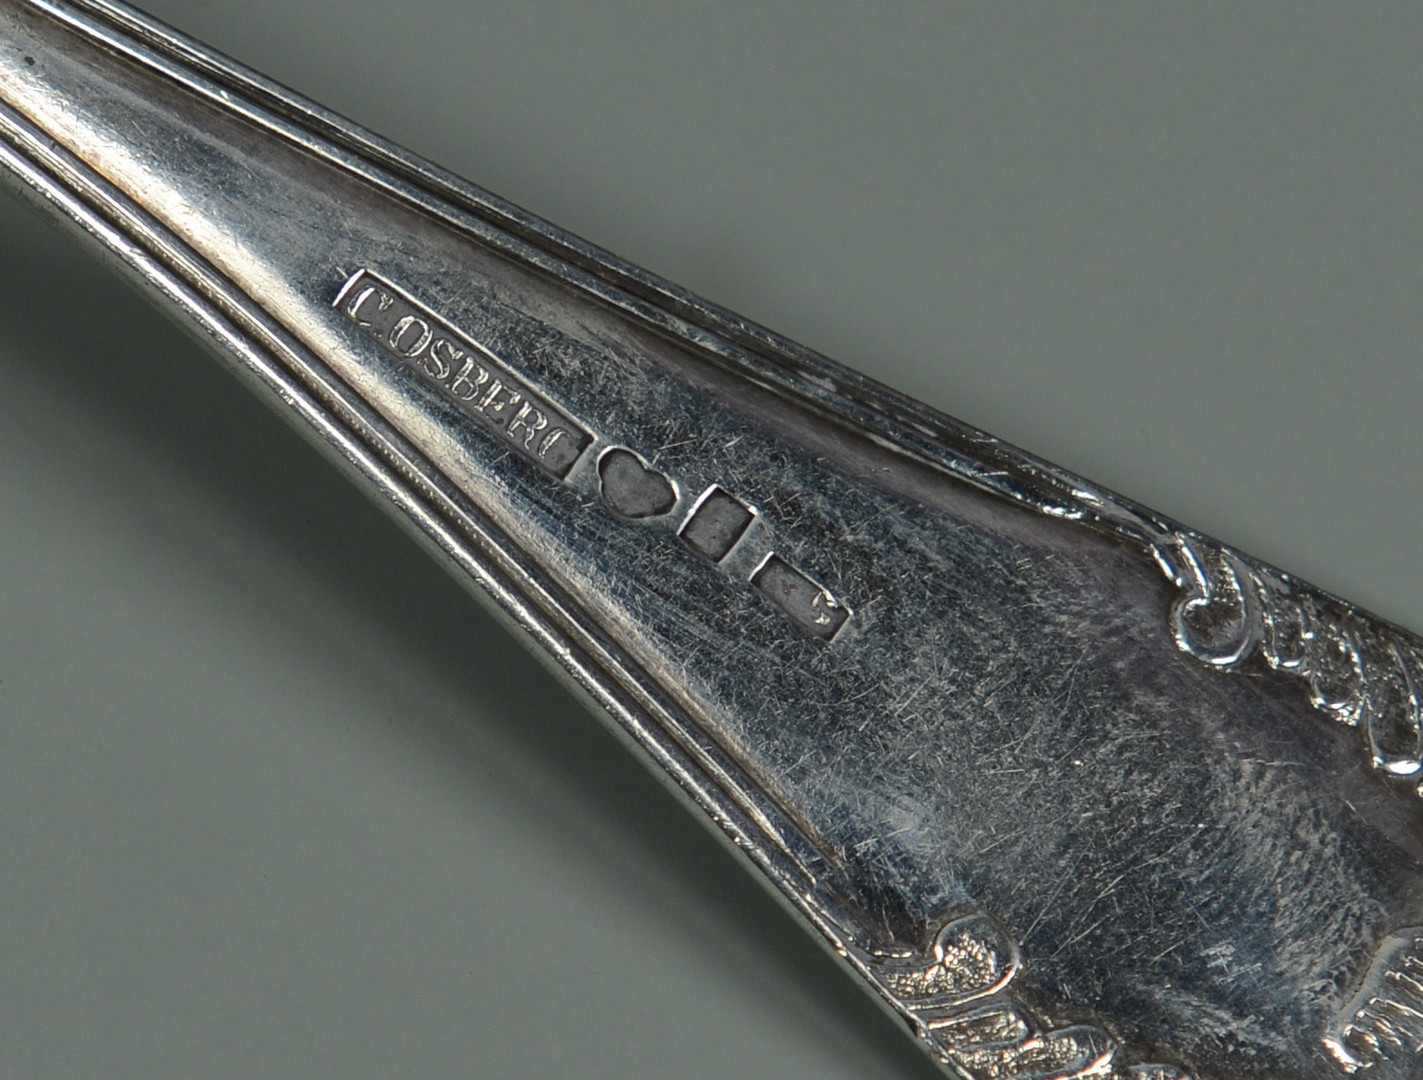 Lot 614: American & European Silver Flatware, 49 pcs.